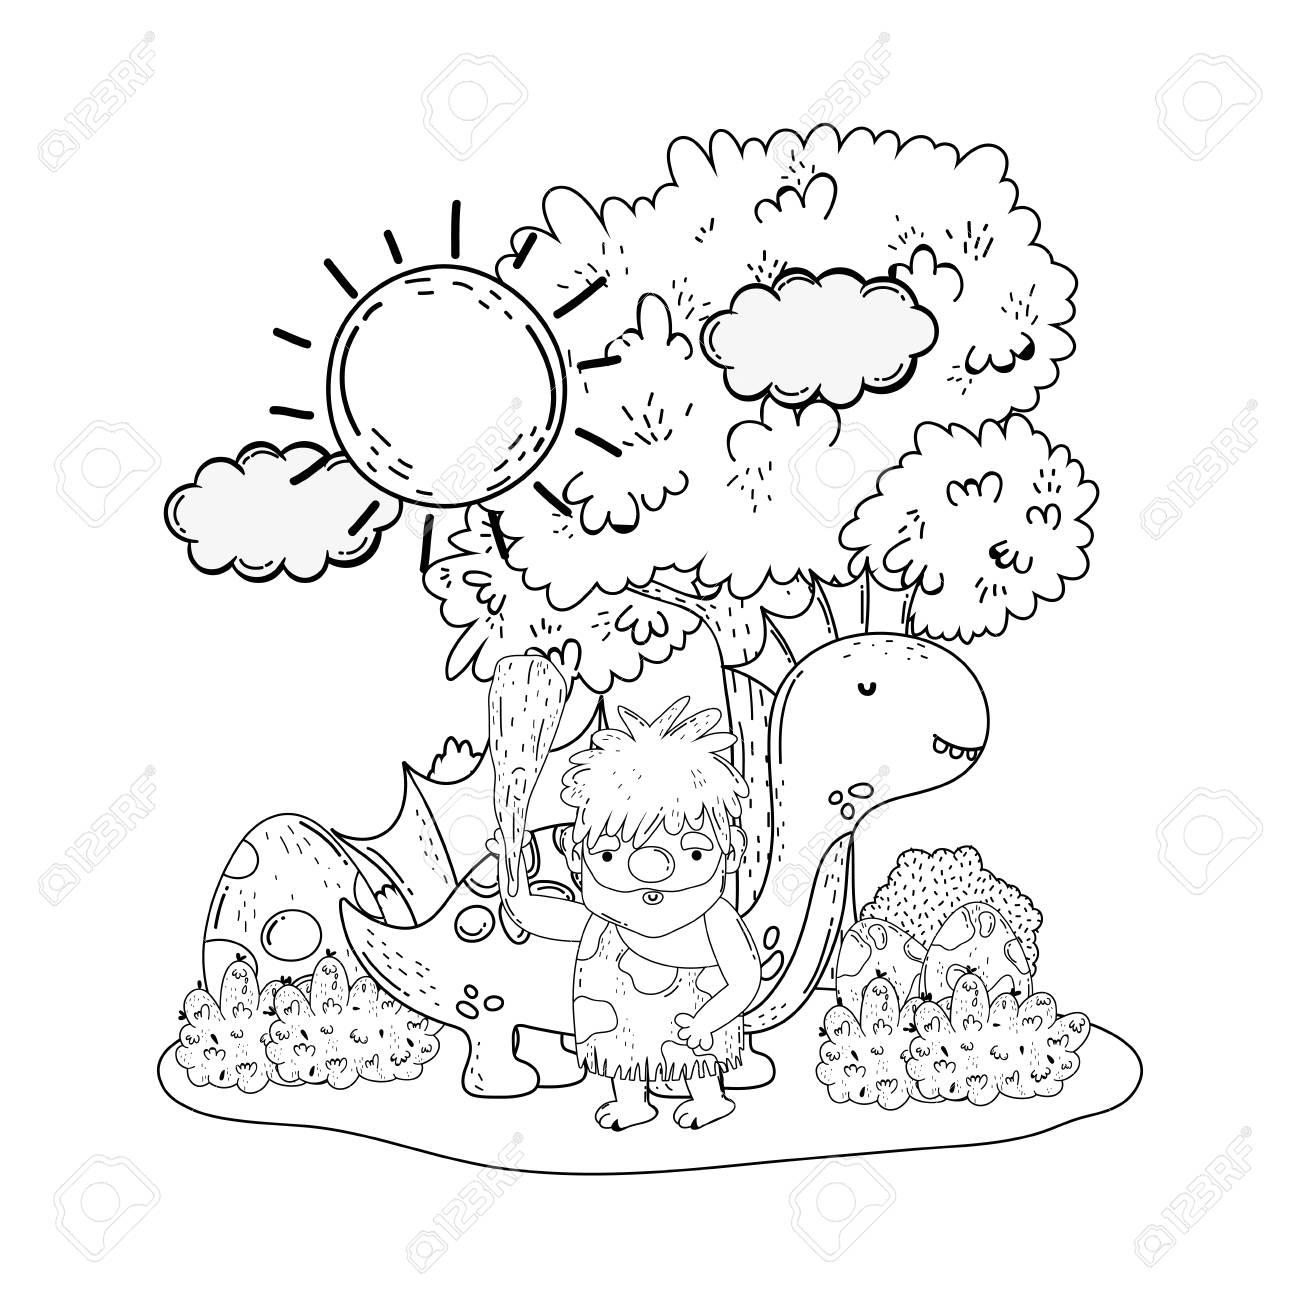 caveman with dinosaur in the landscape vector illustration design - 125816336